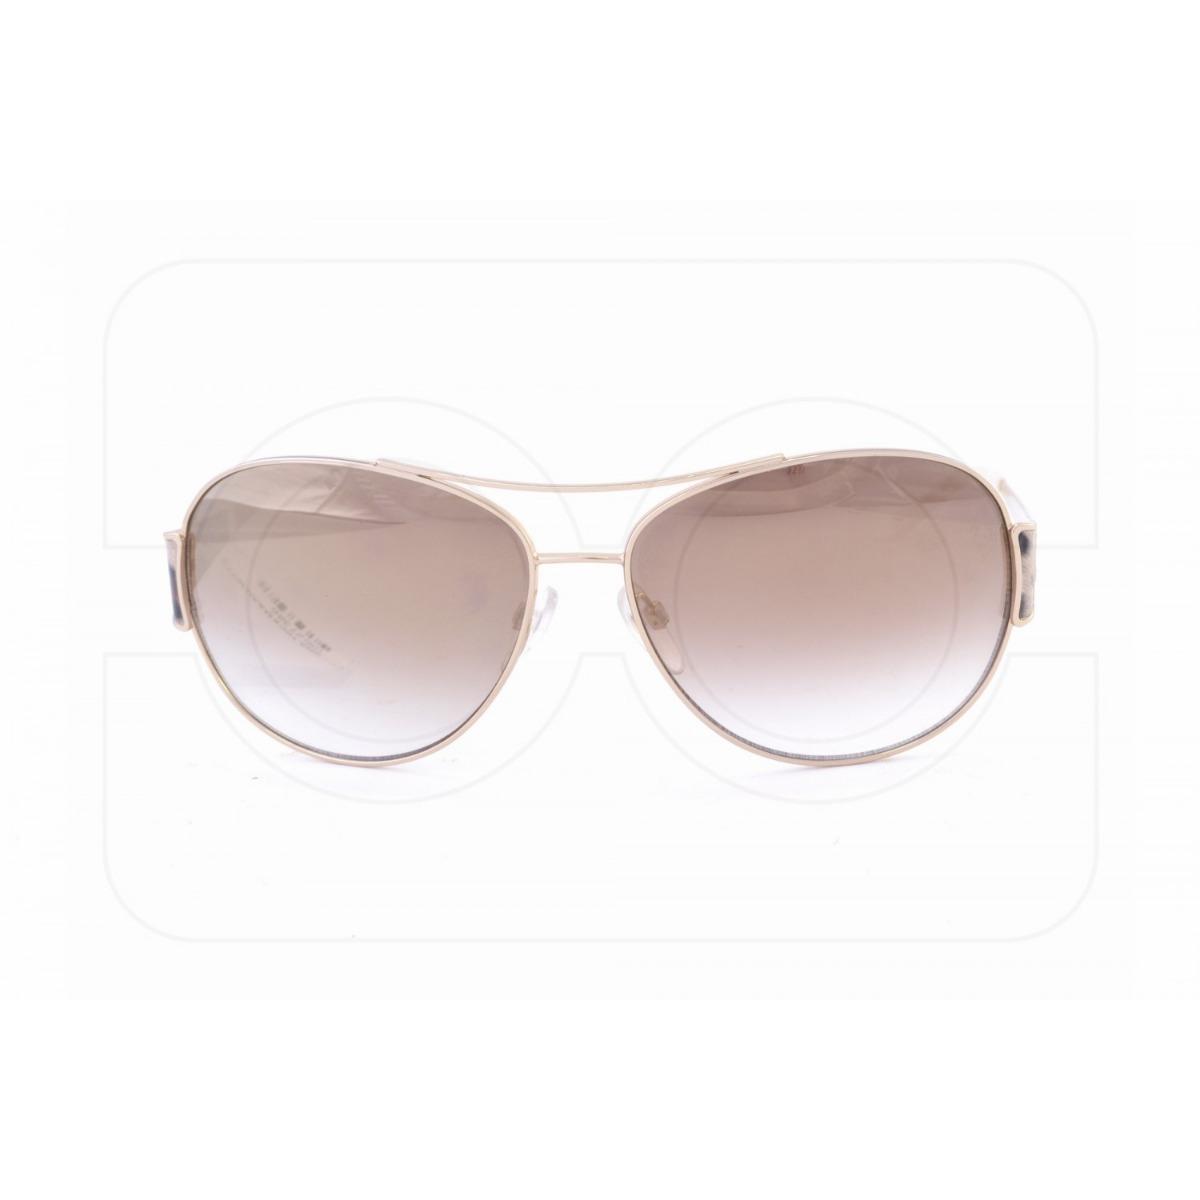 Oculos De Sol Ana Hickmann - Oval - Ah3077 04e Ref 421 - R  299,00 ... fce0df4839